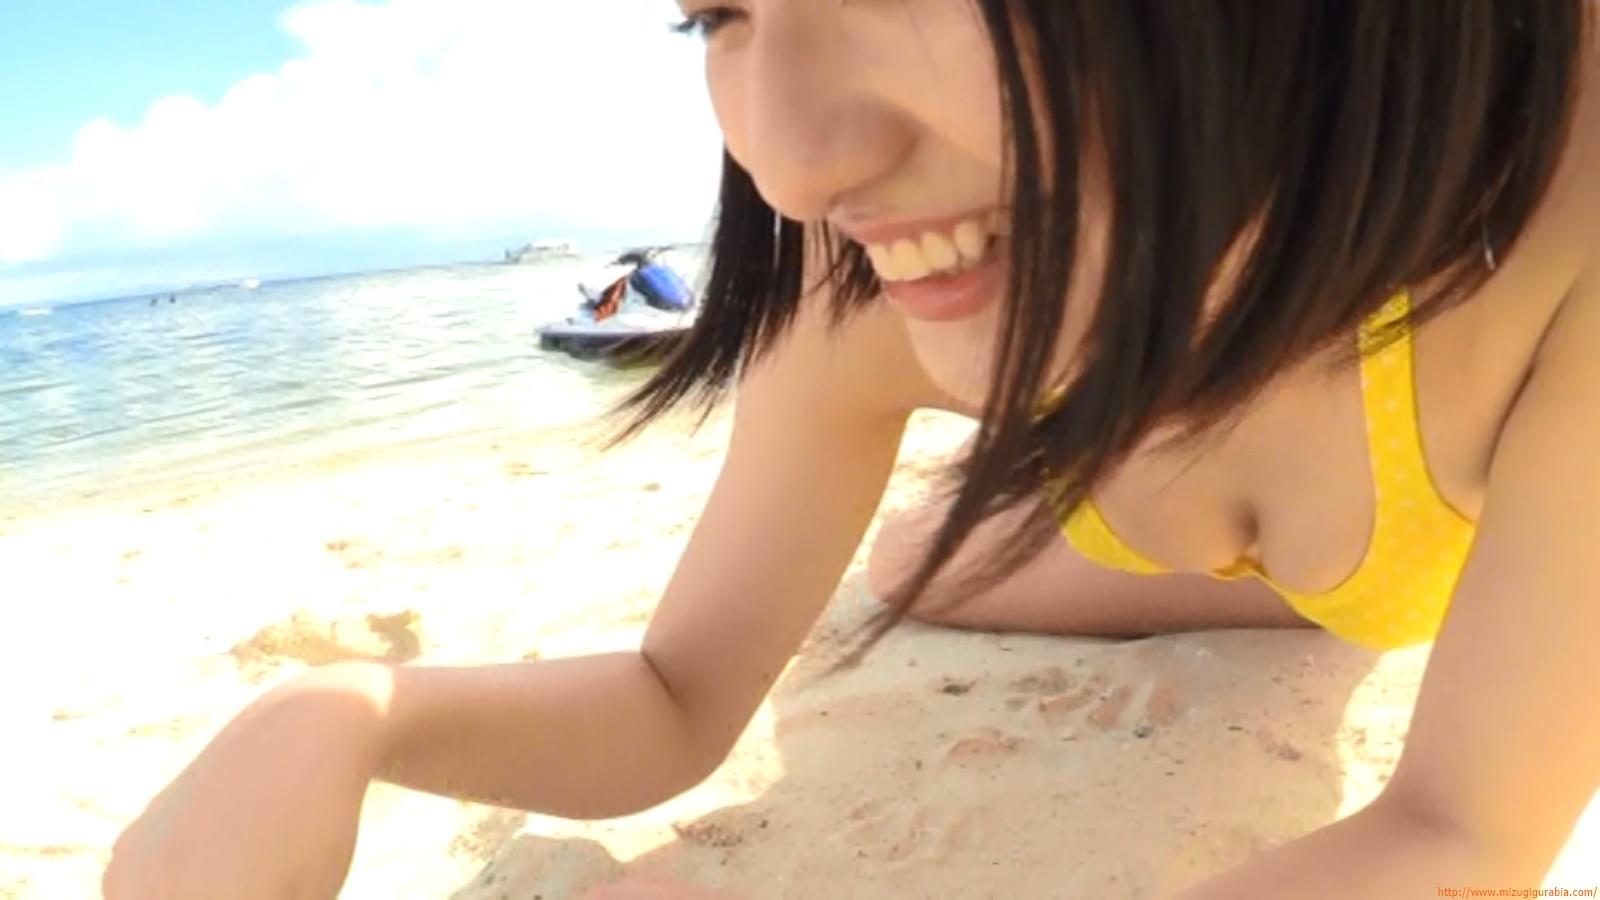 Beach dating254